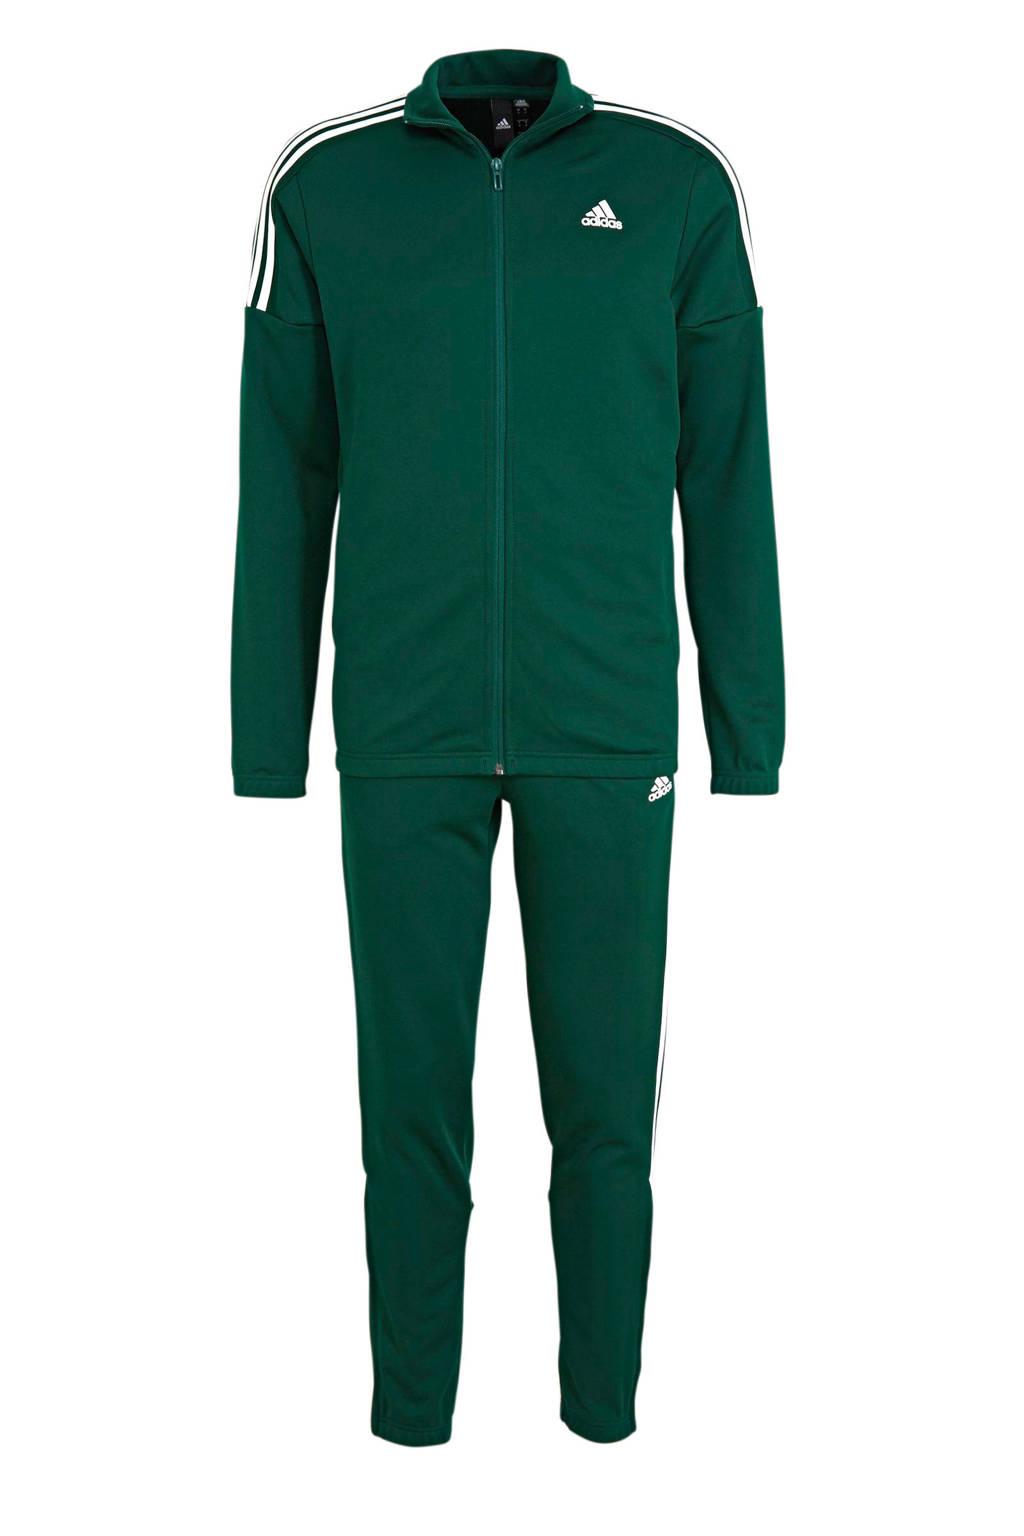 adidas Performance   trainingspak groen/wit, Groen/wit